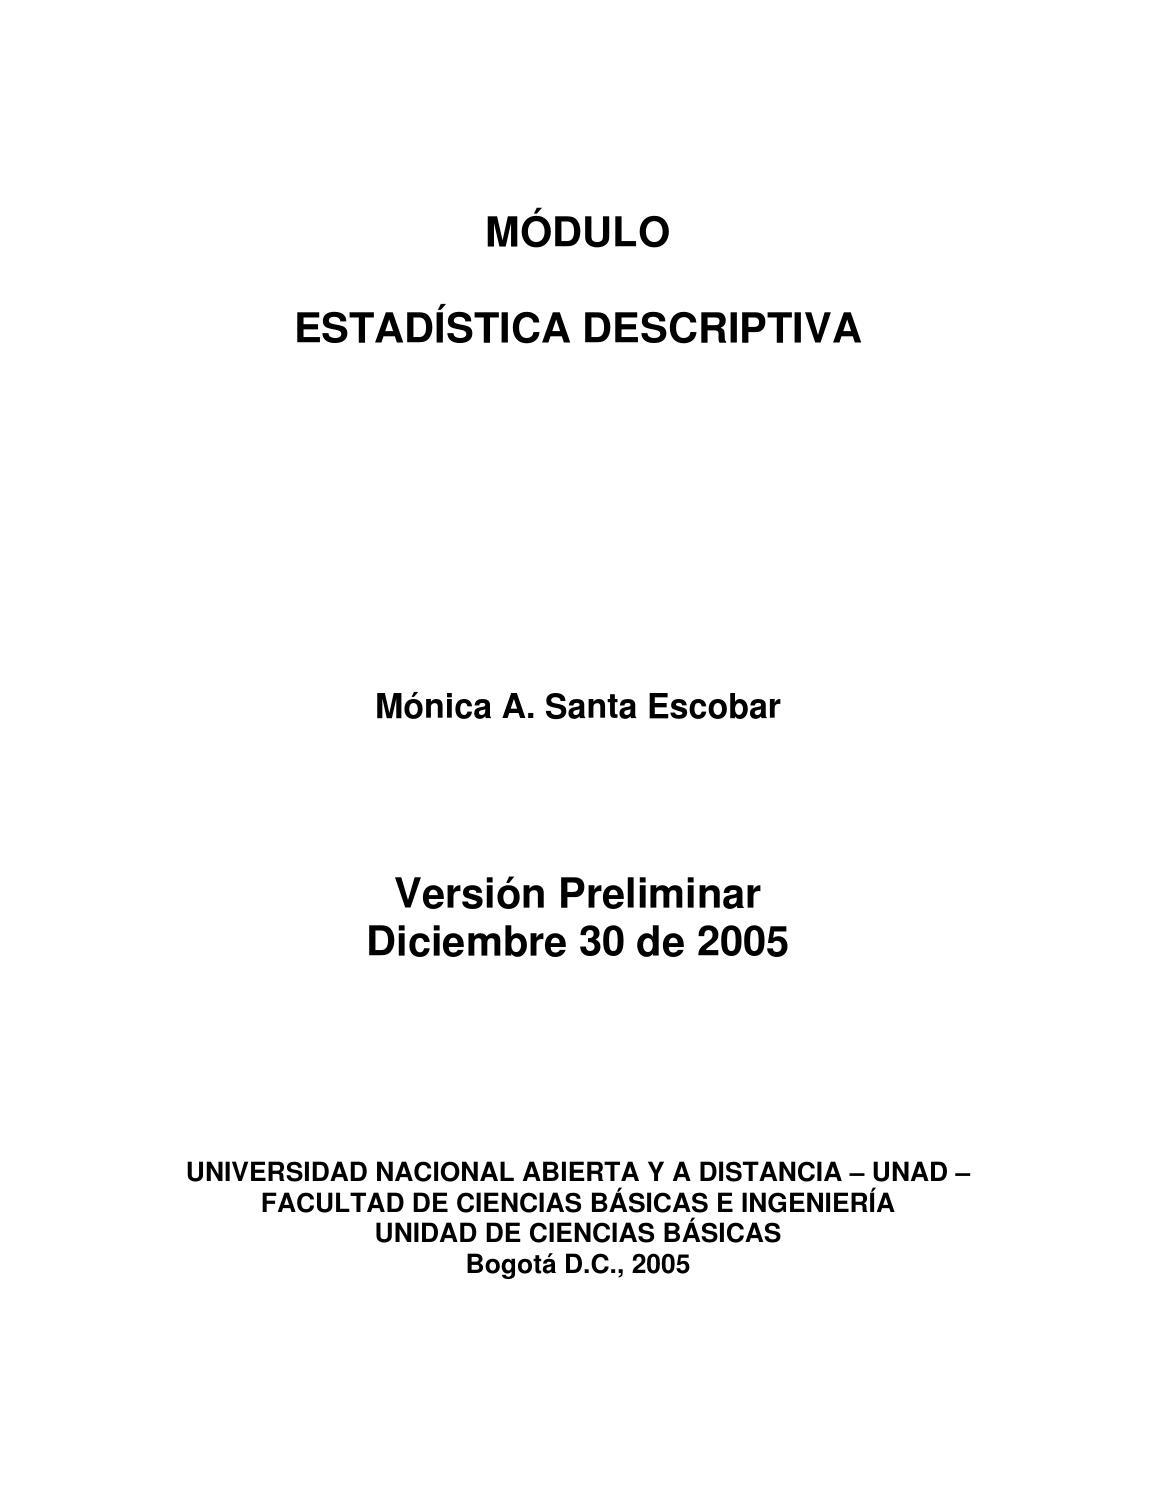 Modulo de estadistica descriptiva unad by david pinilla - issuu